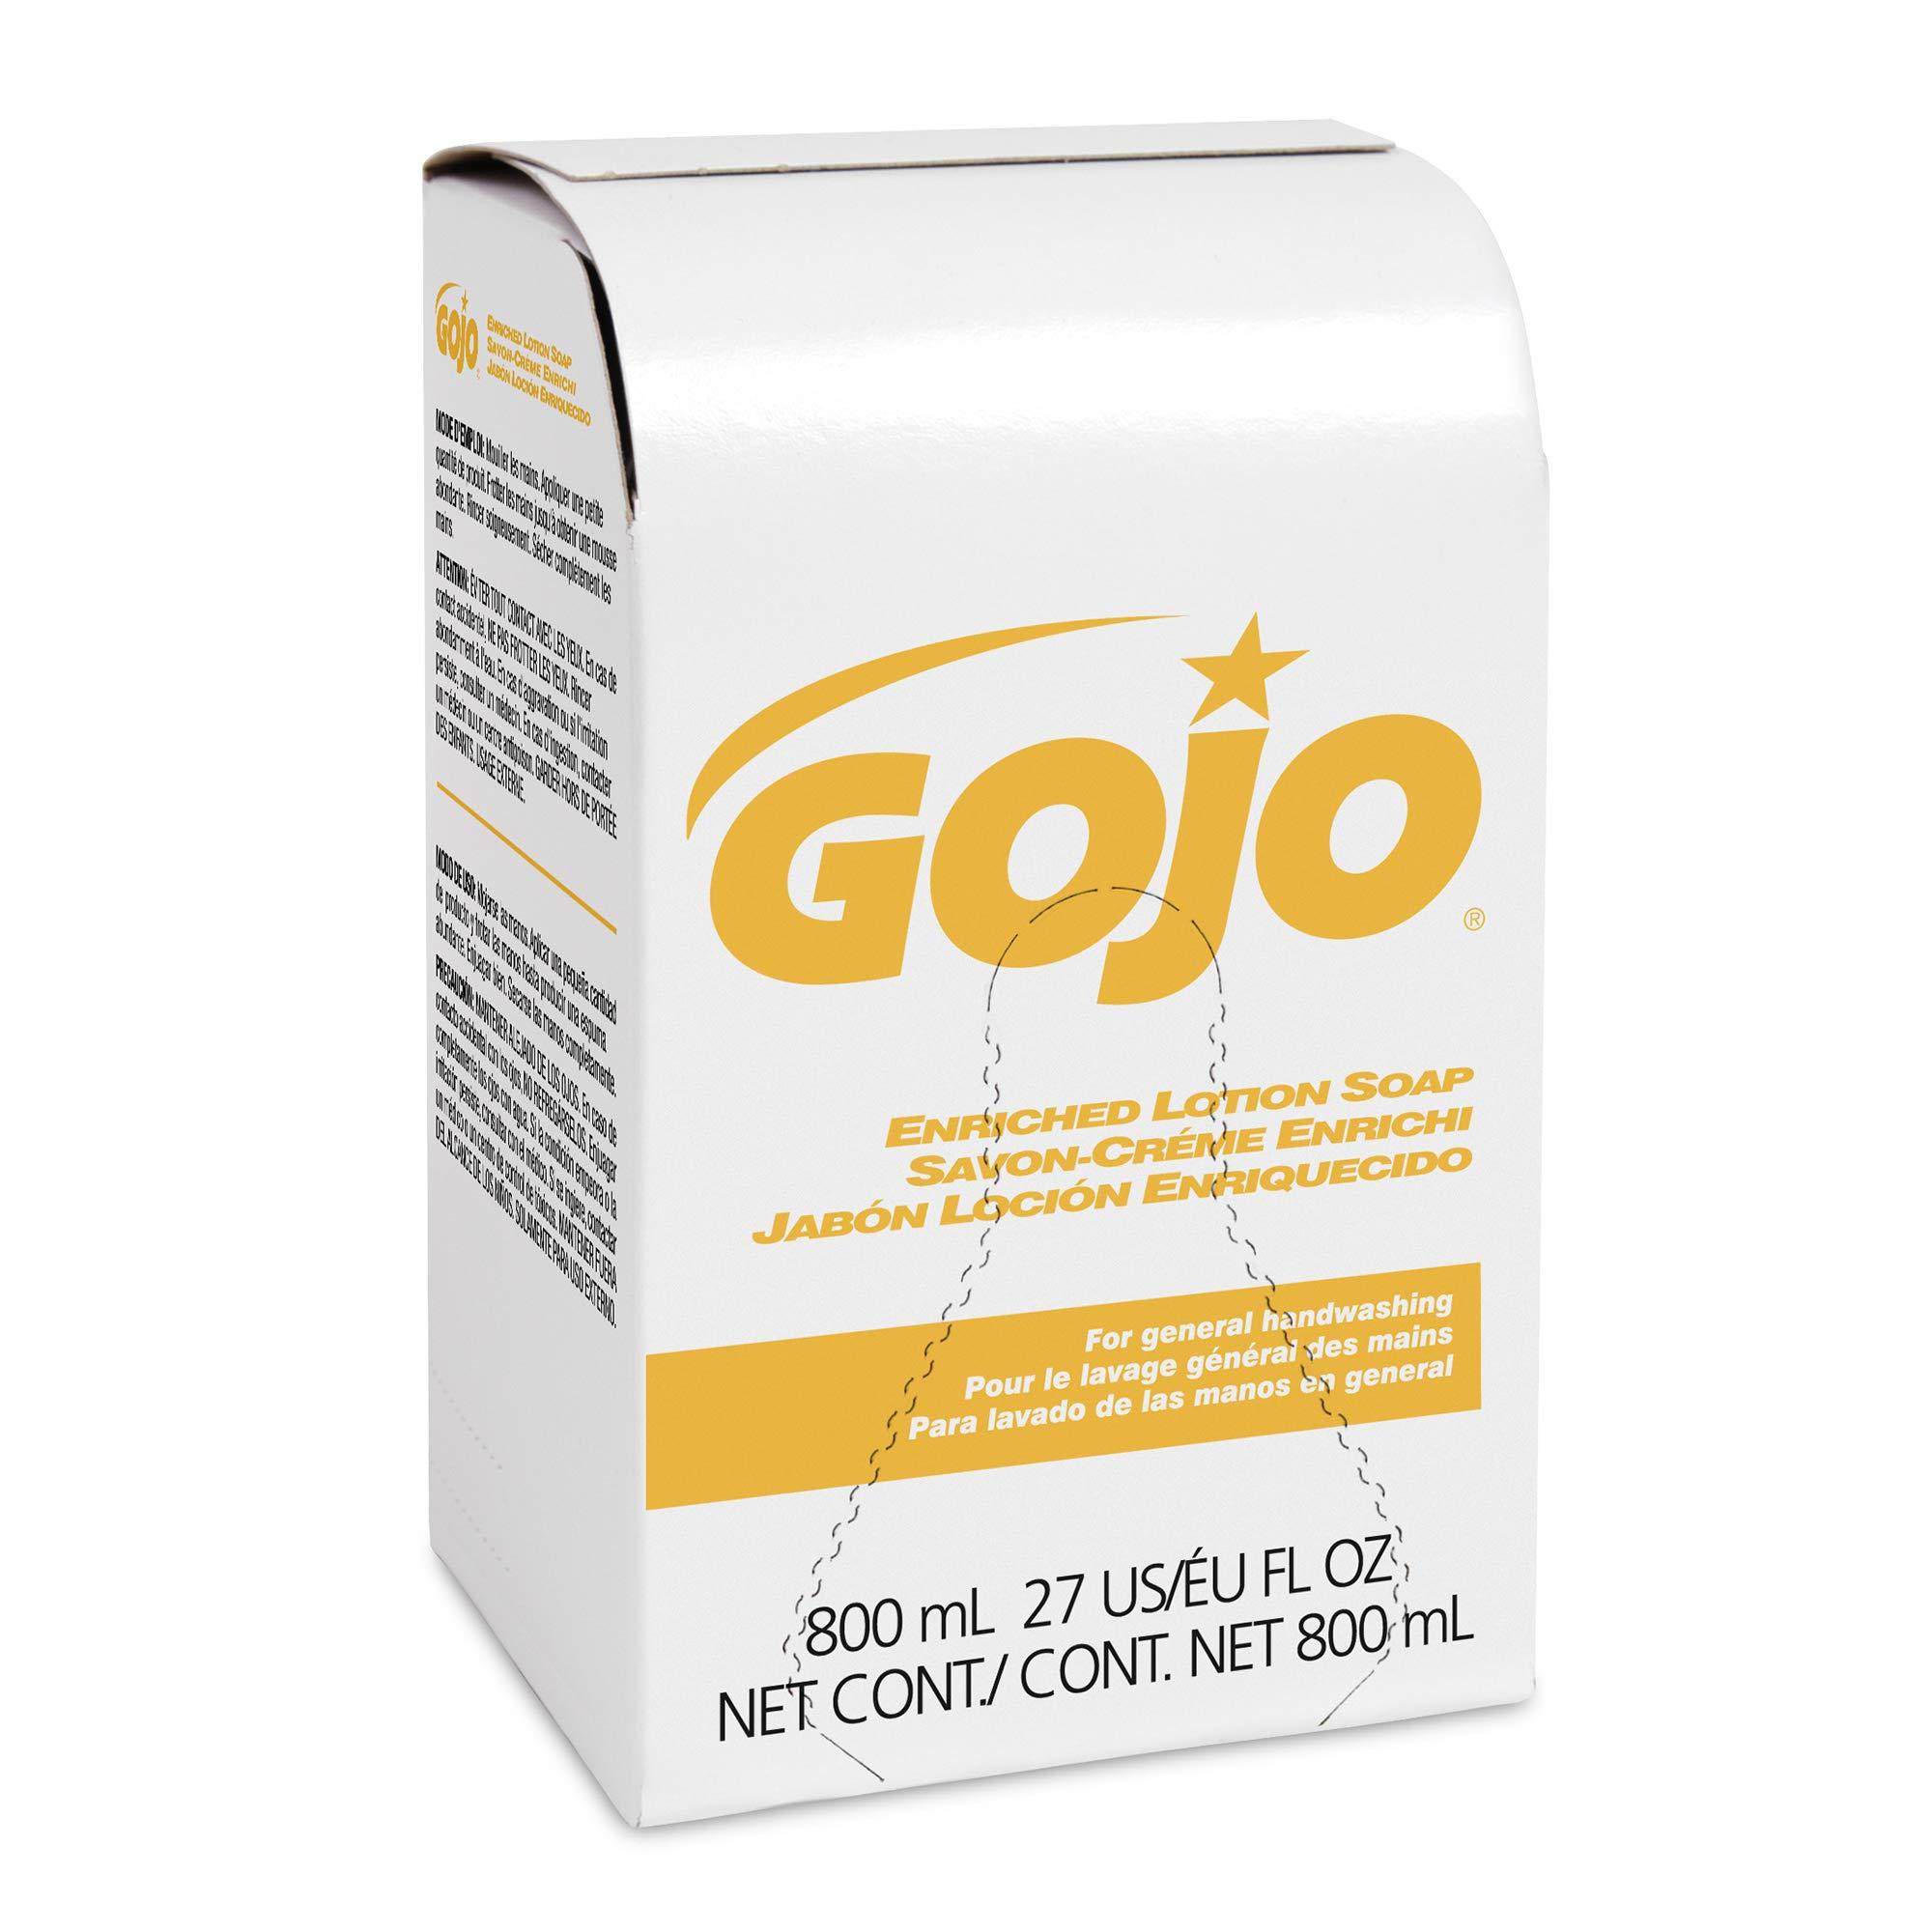 GOJO Enriched Lotion Soap, 800 mL Soap Refill for GOJO 800 Series Bag-In-Box Dispenser (Pack of 12) - 9102-12 by Gojo